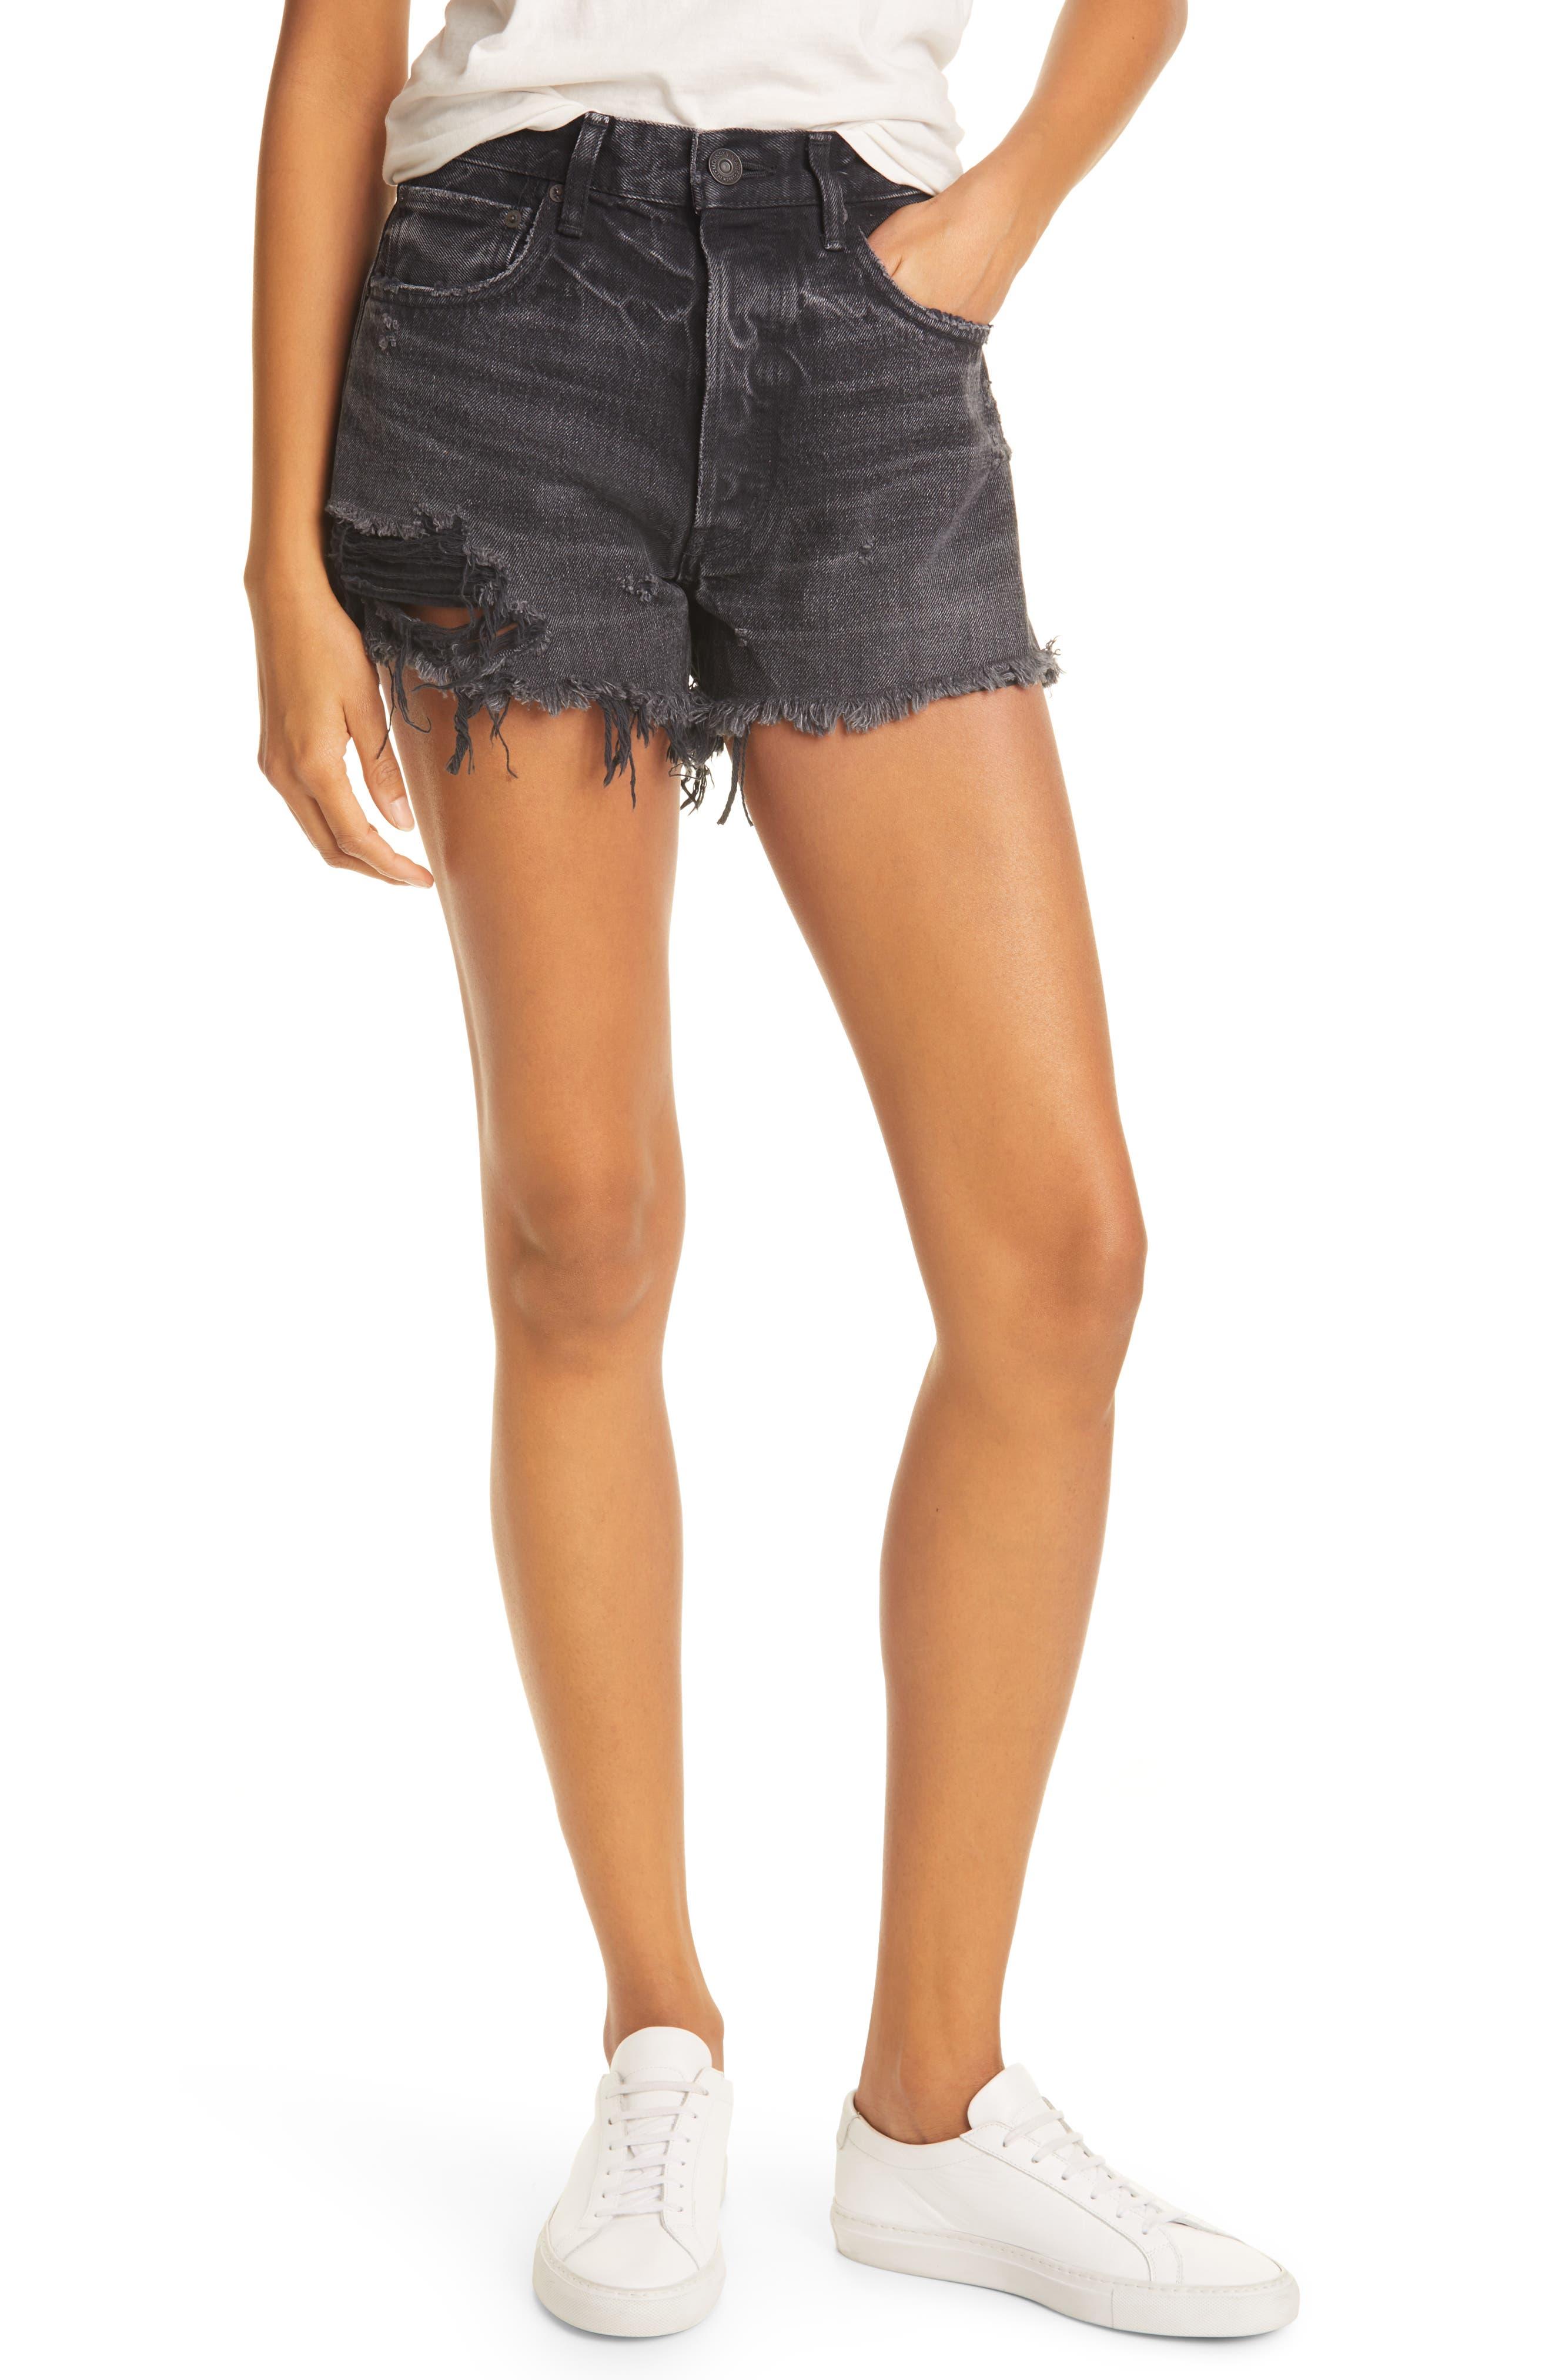 Durango Distressed Denim Shorts